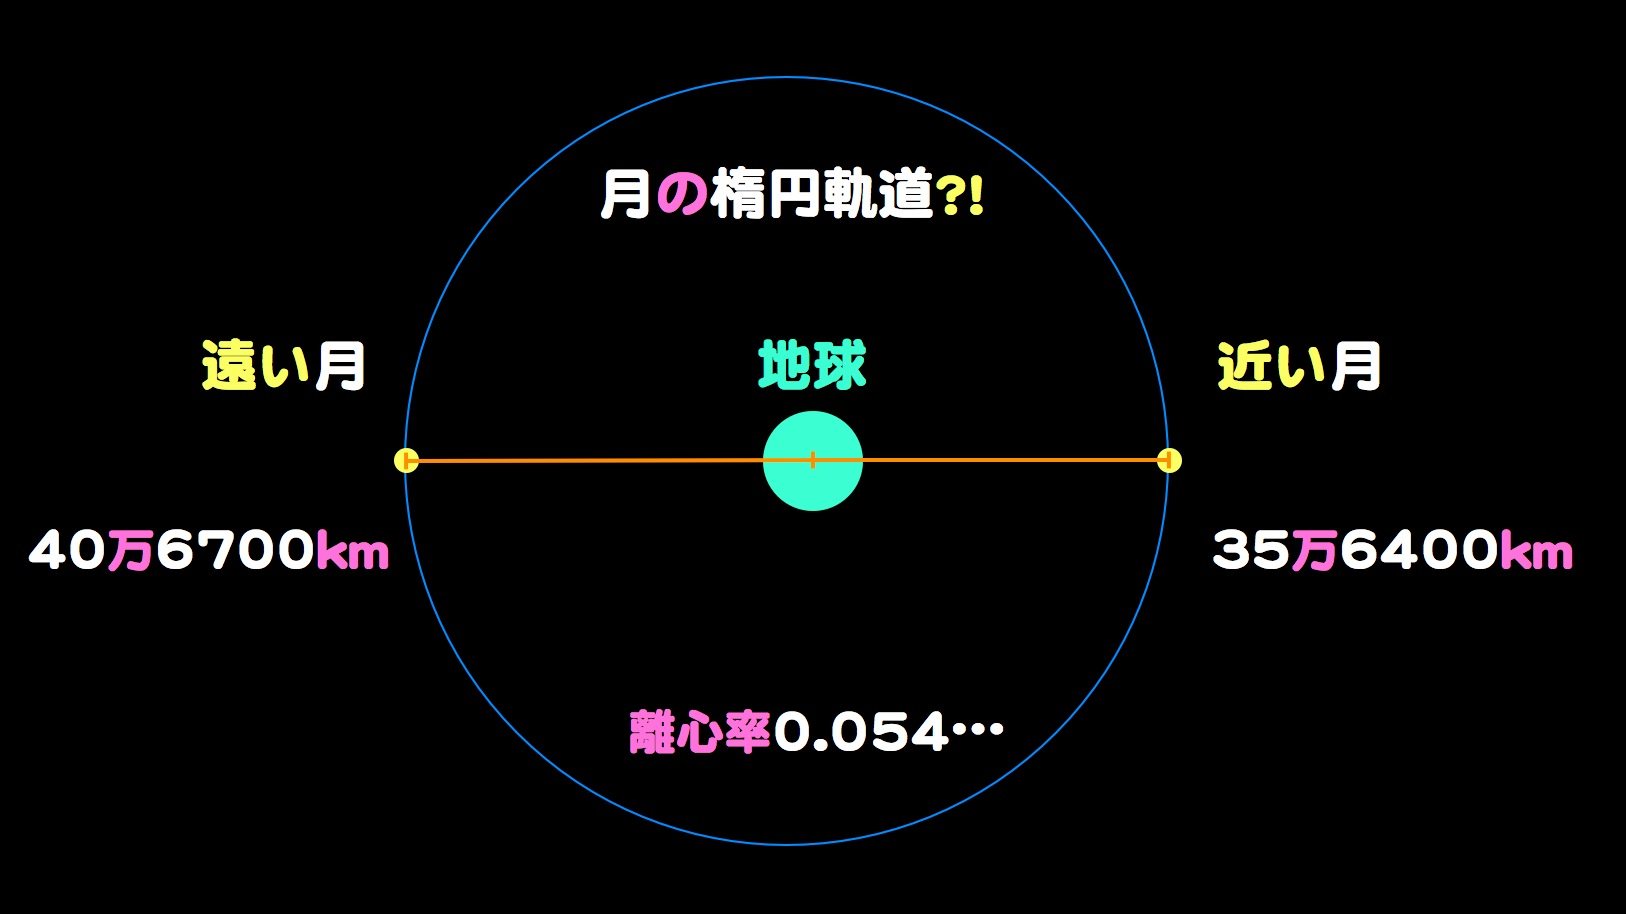 http://www.ncsm.city.nagoya.jp/study/astro/m-crop.jpg